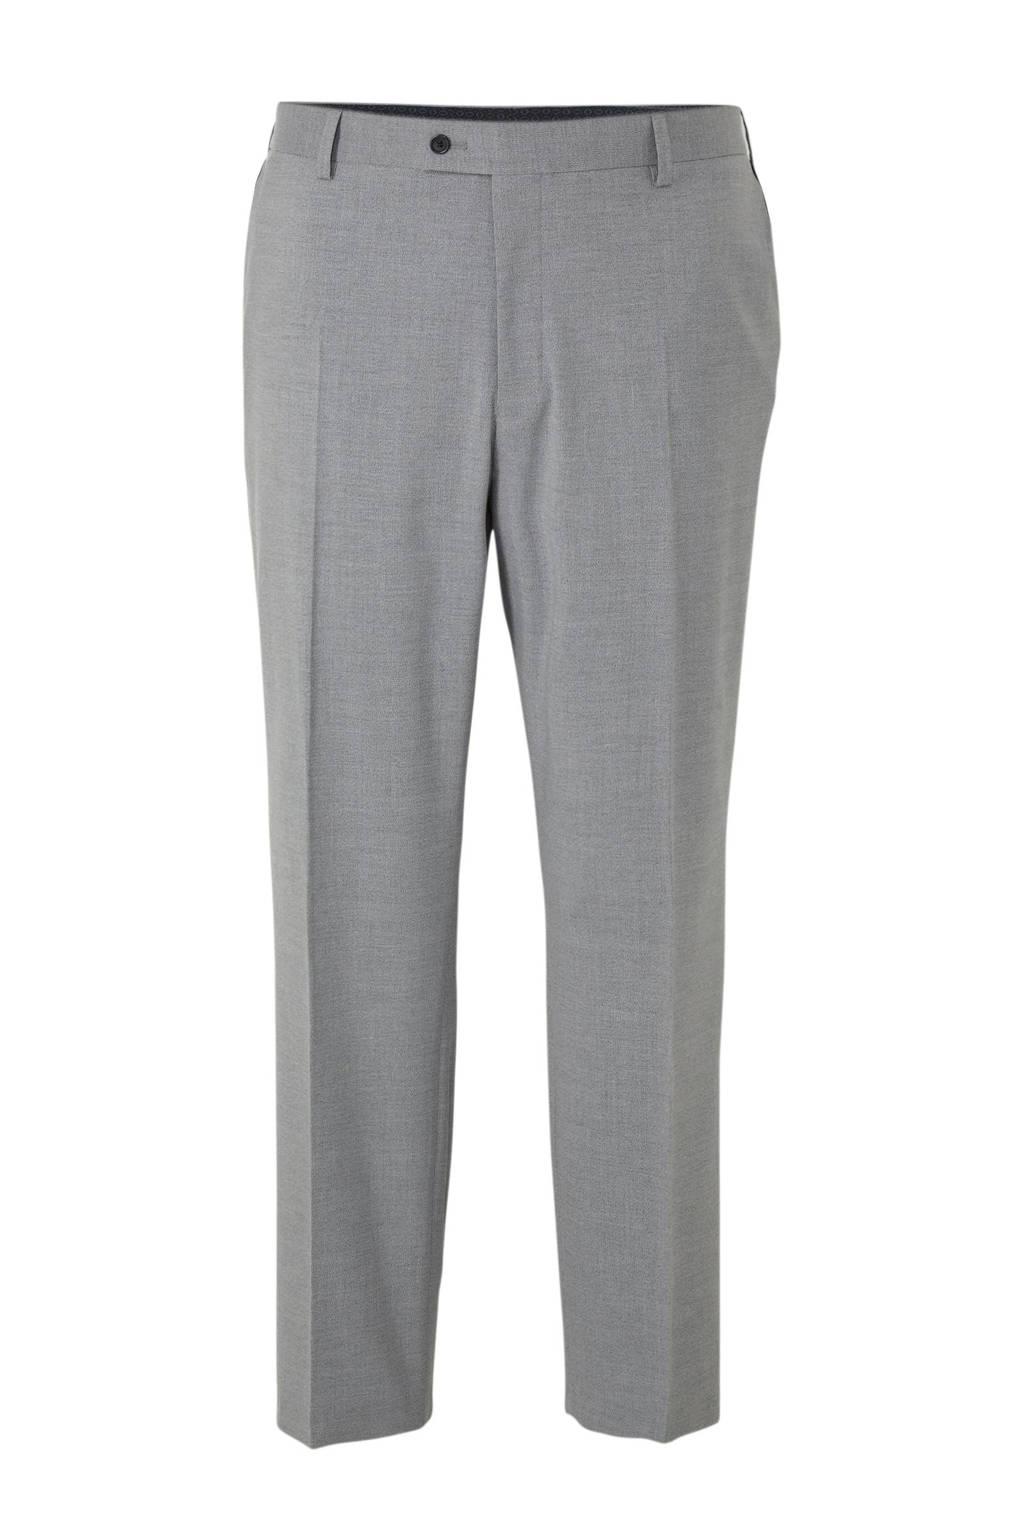 C&A XL Canda gemêleerde slim fit pantalon grijs, Grijs